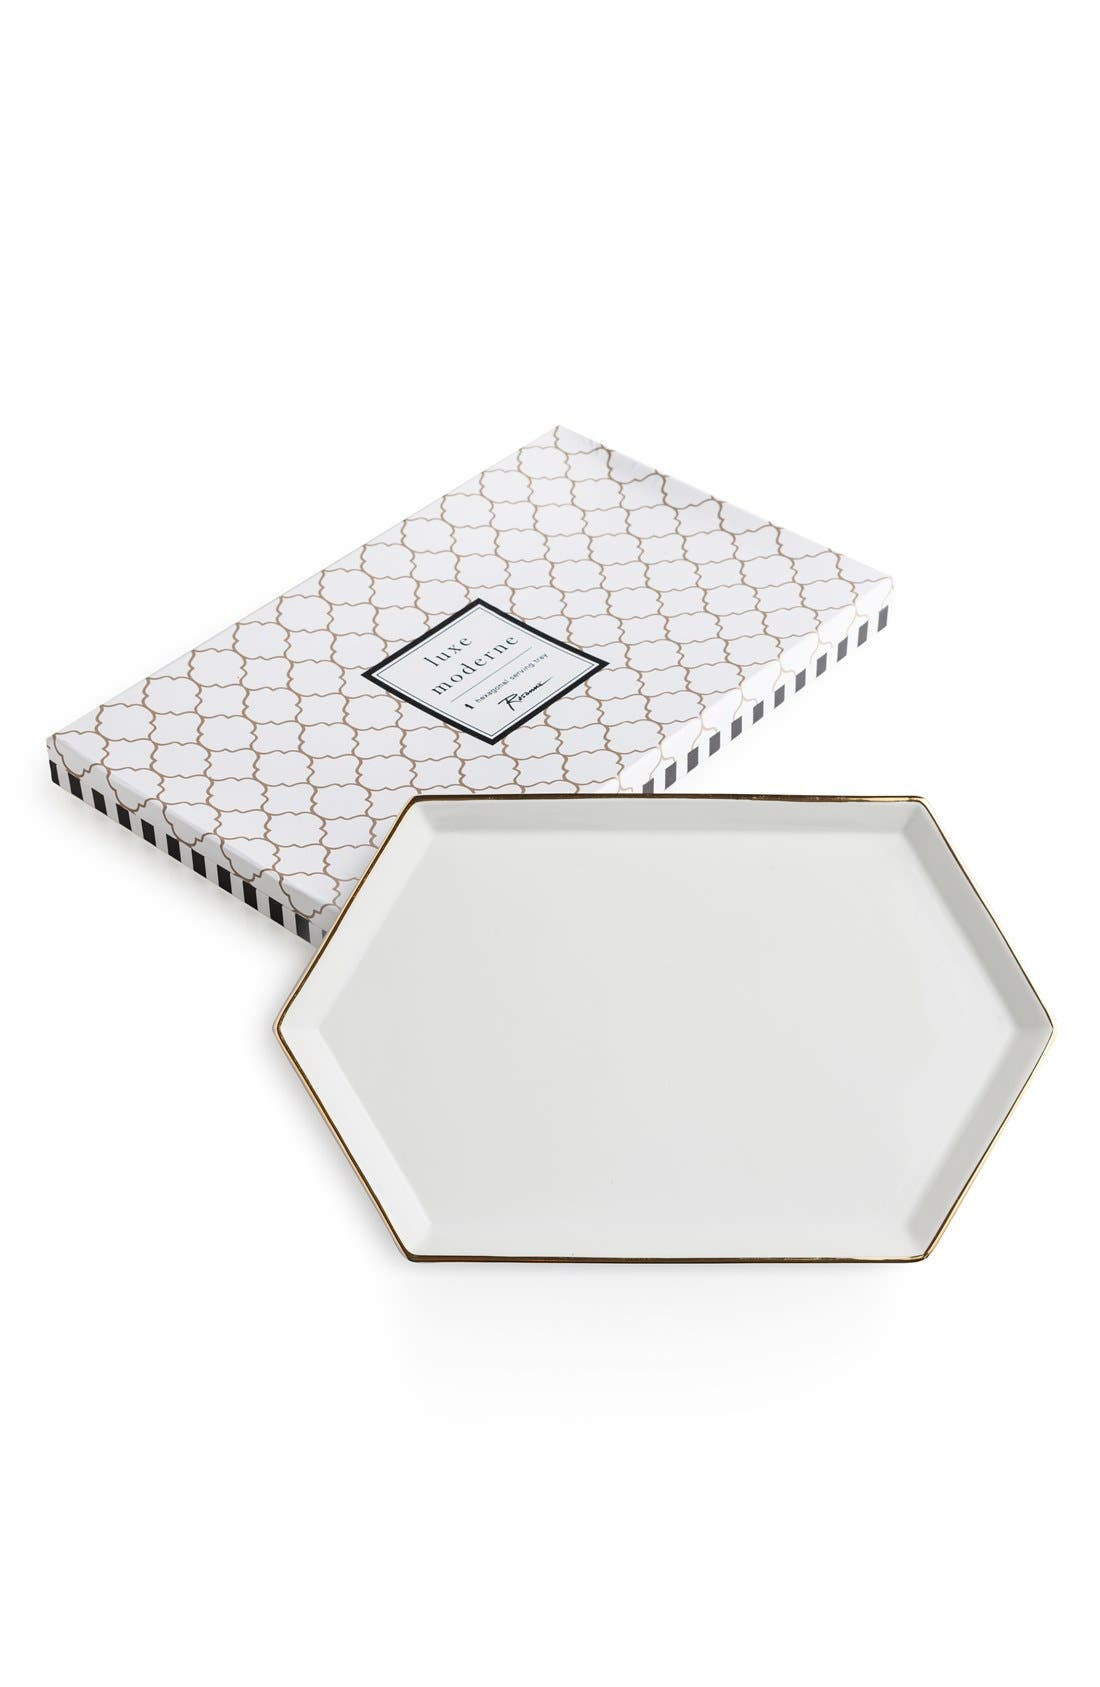 'Luxe Moderne' Hexagonal Tray by ROSANNA